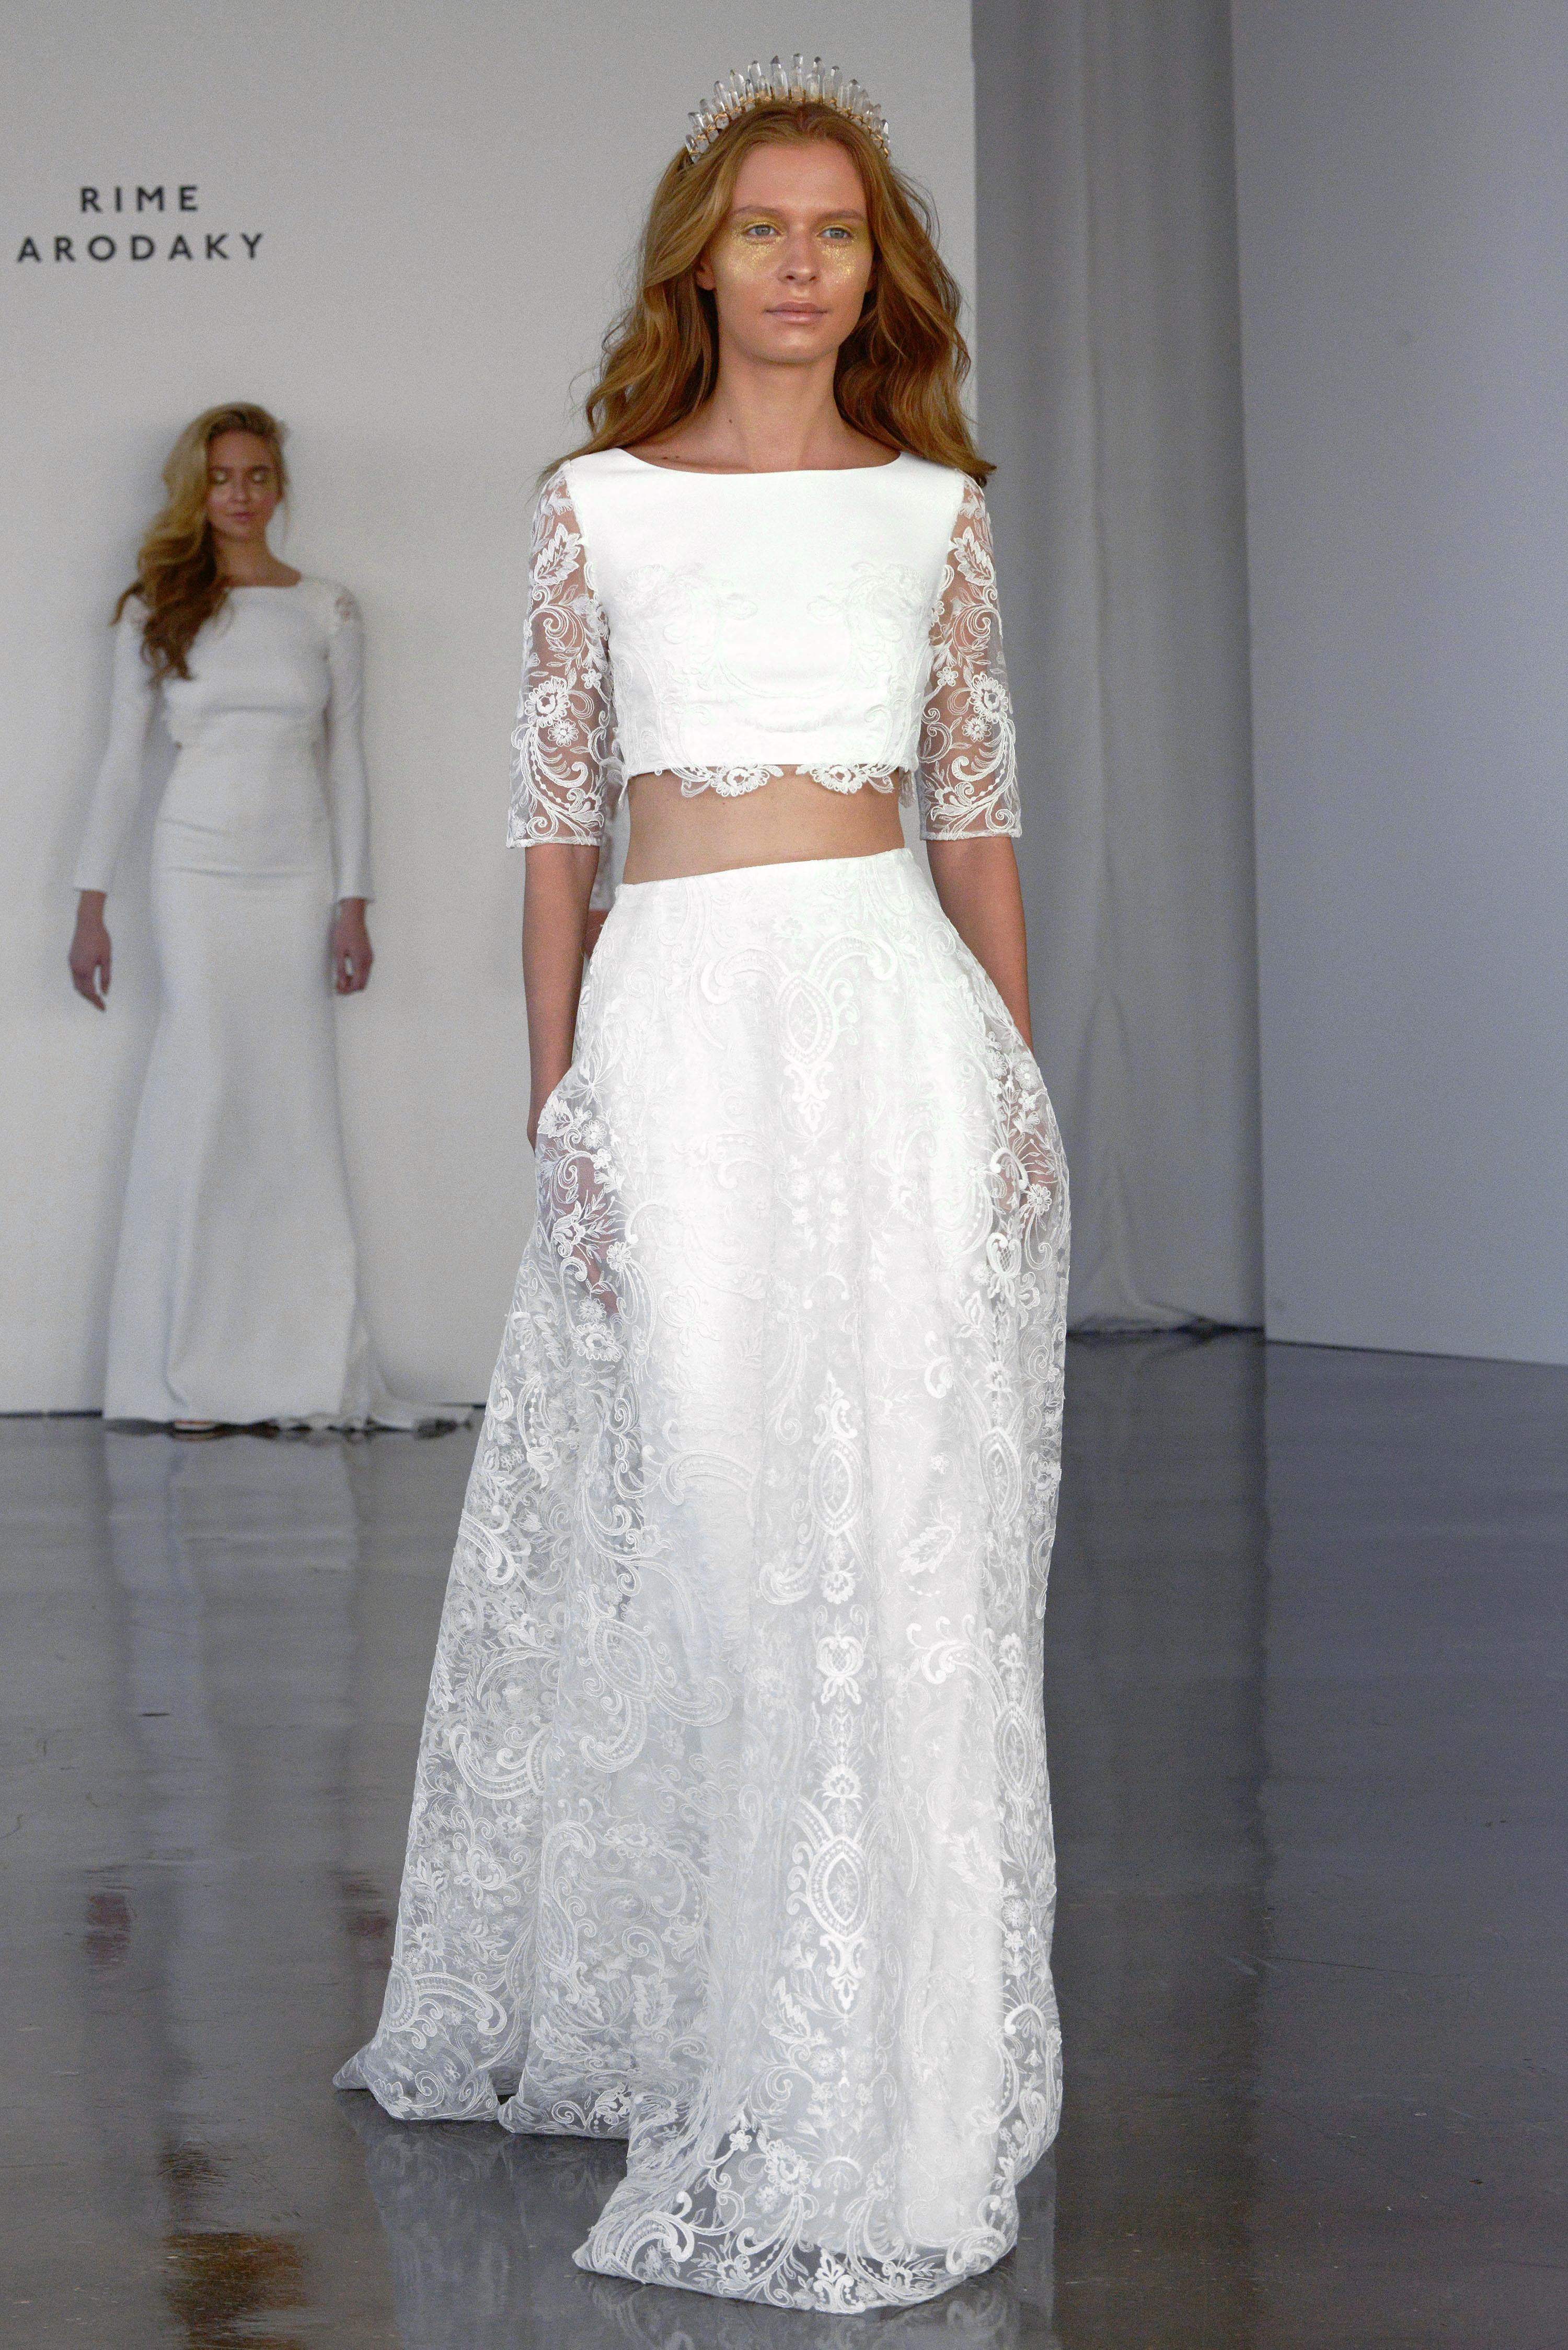 Rime Arodaky wedding dress - 7 Fall 2017